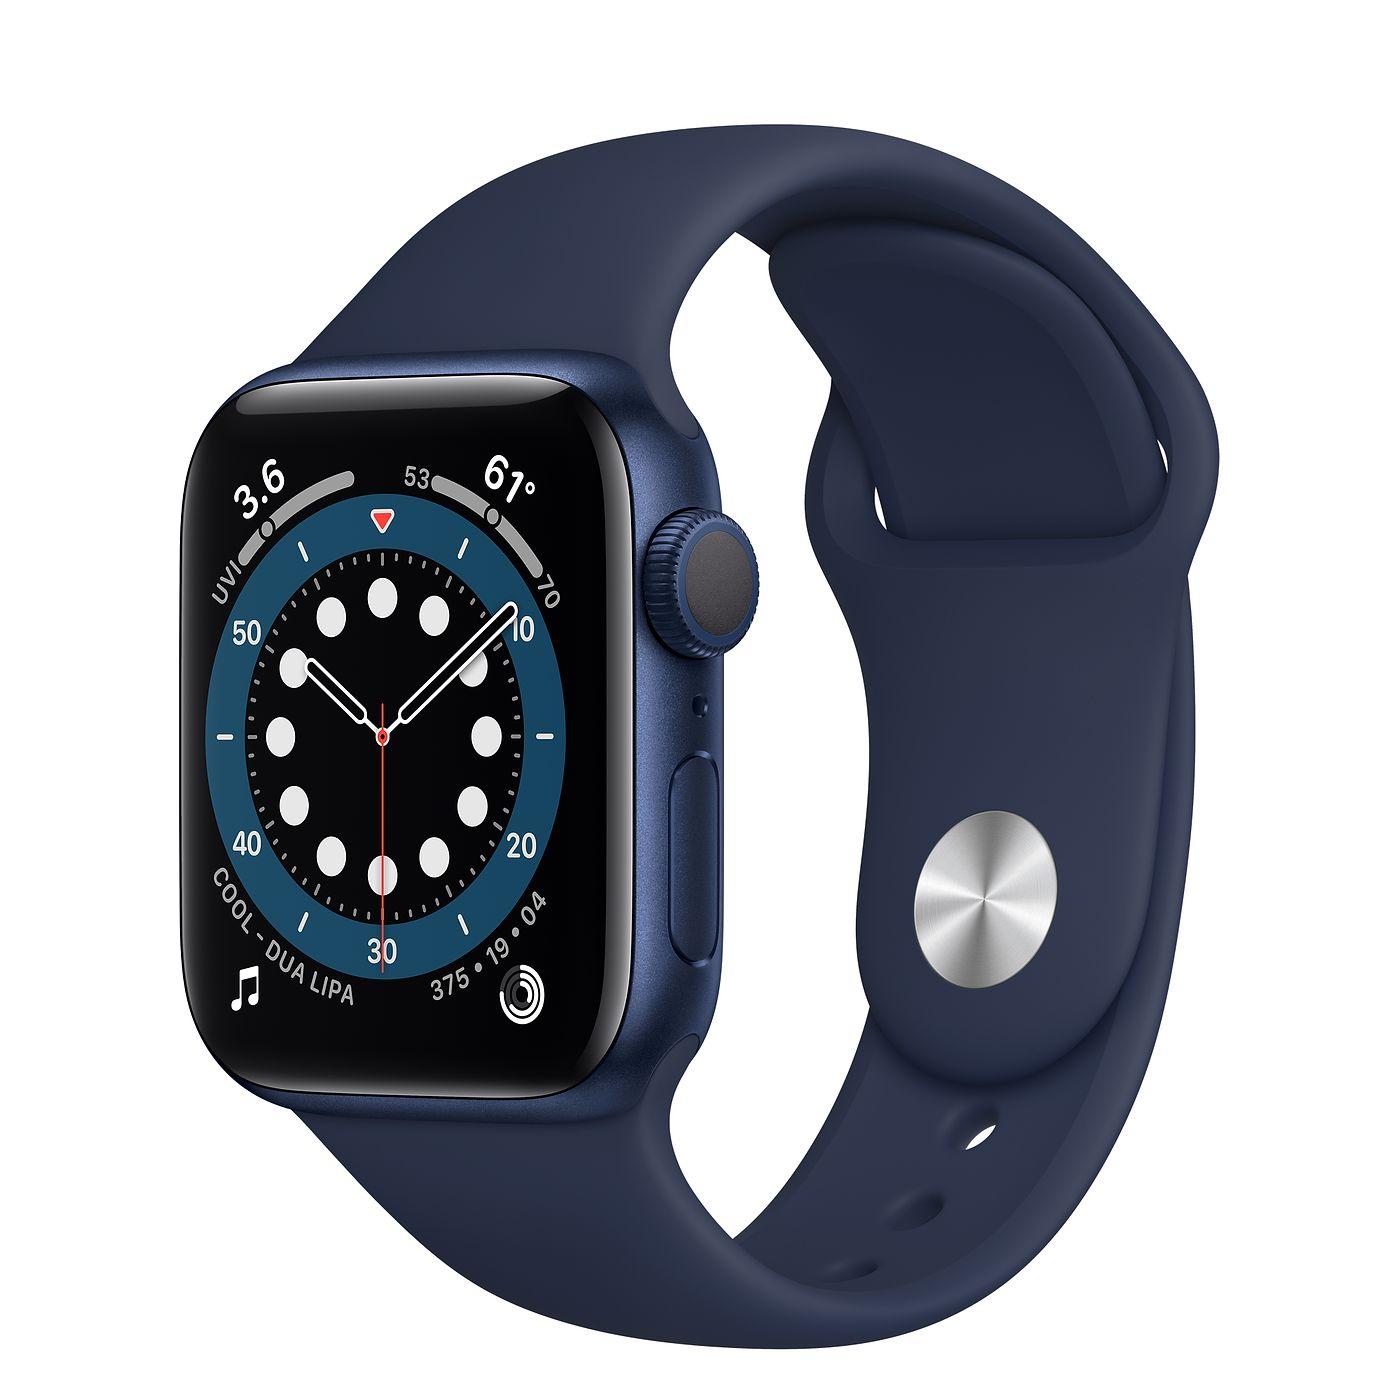 Apple 애플워치 6, GPS, 블루 알루미늄 케이스, 딥 네이비 스포츠 밴드